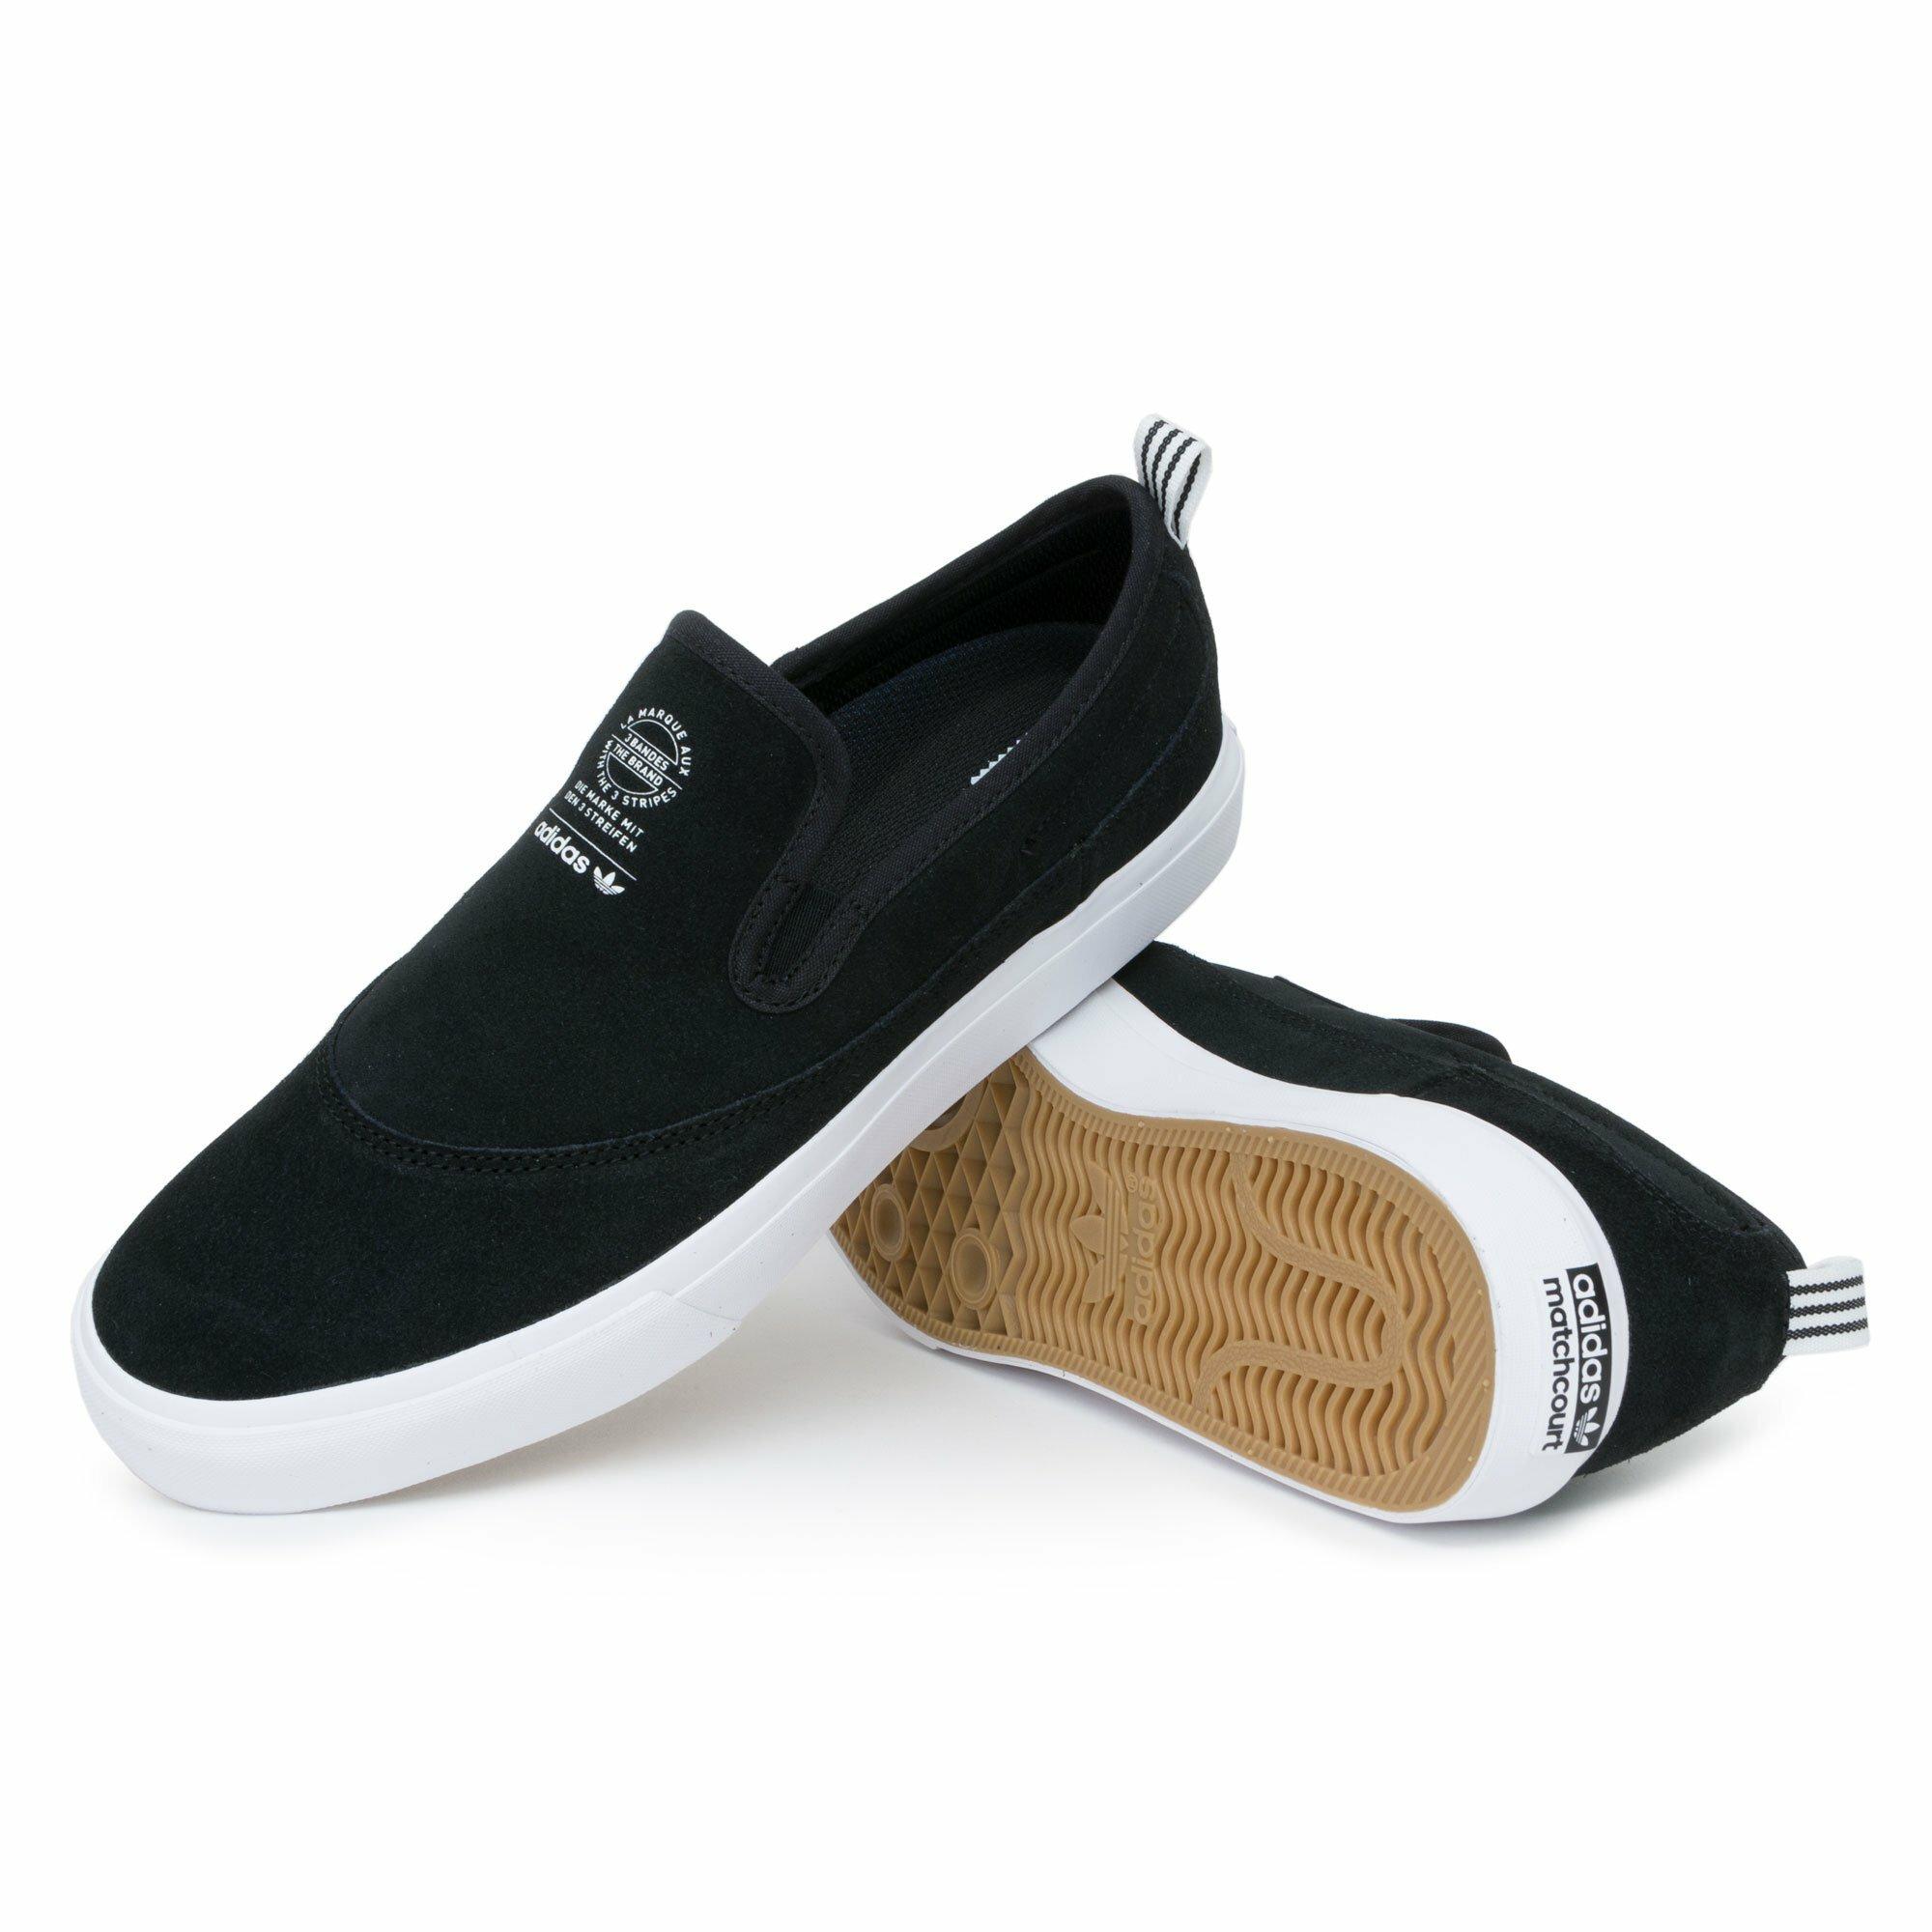 adidas Skateboarding / Matchcourt Slip